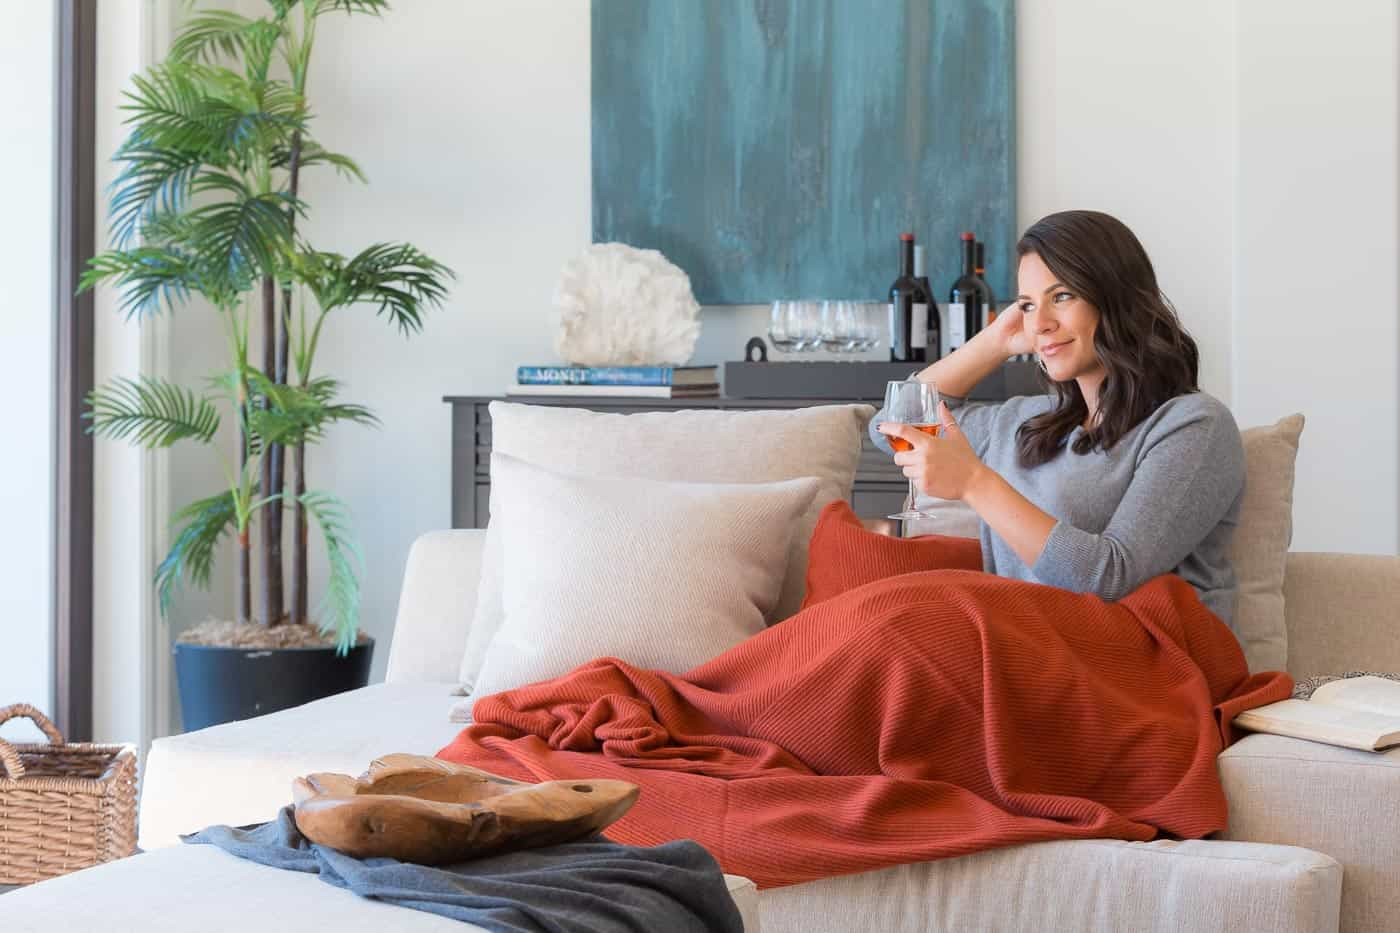 interior design ideas, decorating ideas, living room ideas - My Style Vita @mystylevita